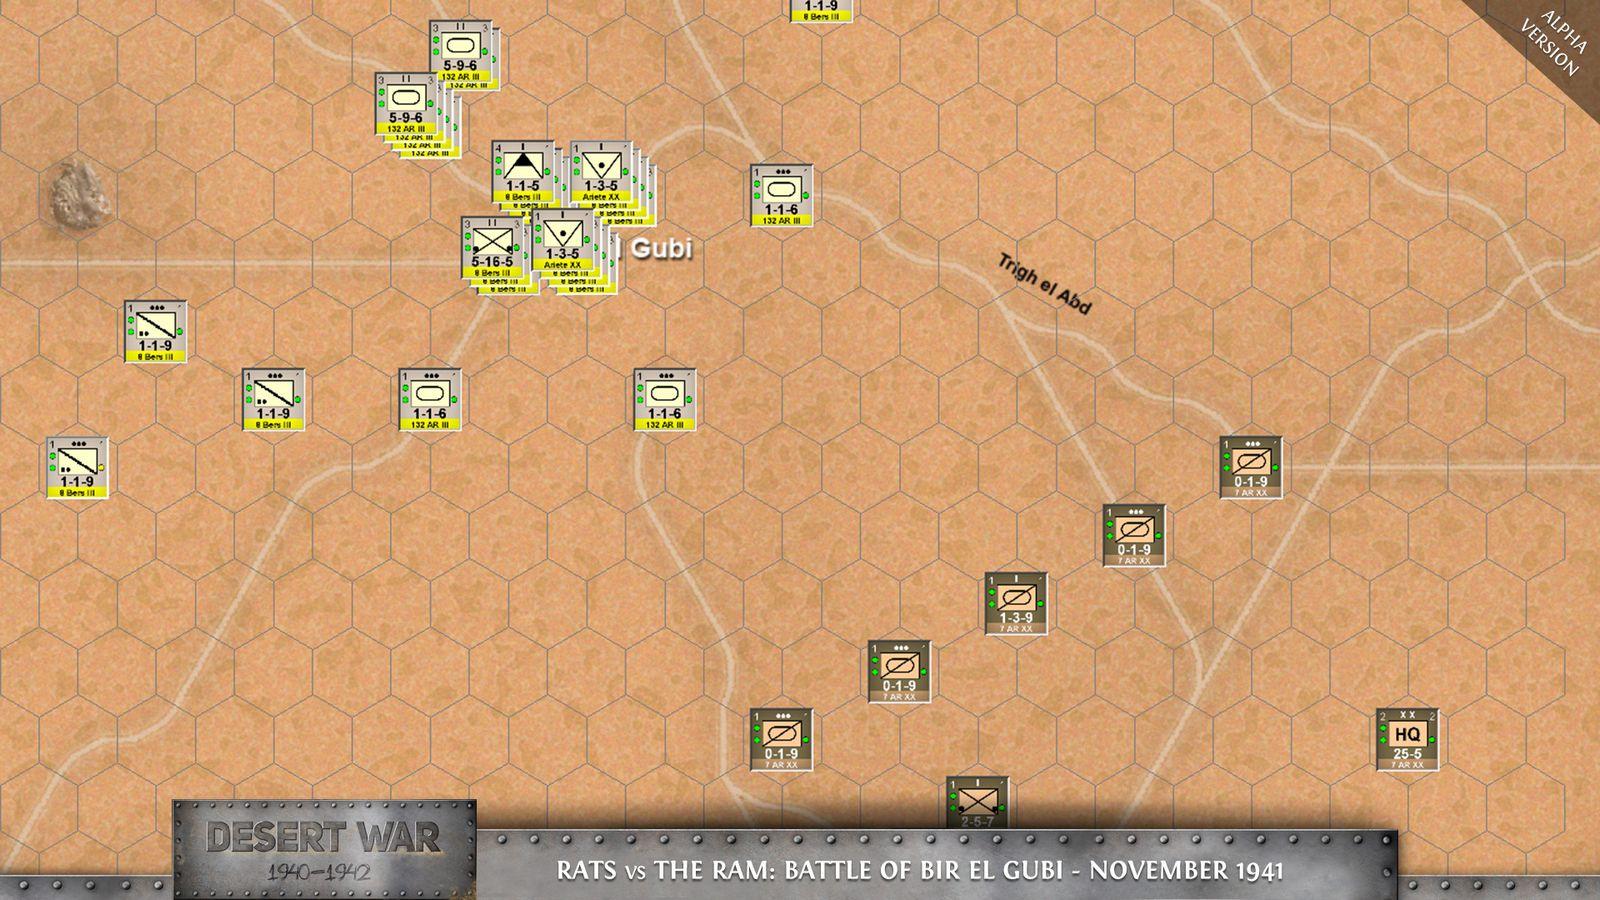 desert-war-40-42-0717-7-Rats_vs_The_Ram_Battle_of_Bir_El_Gubi_Nov_1941